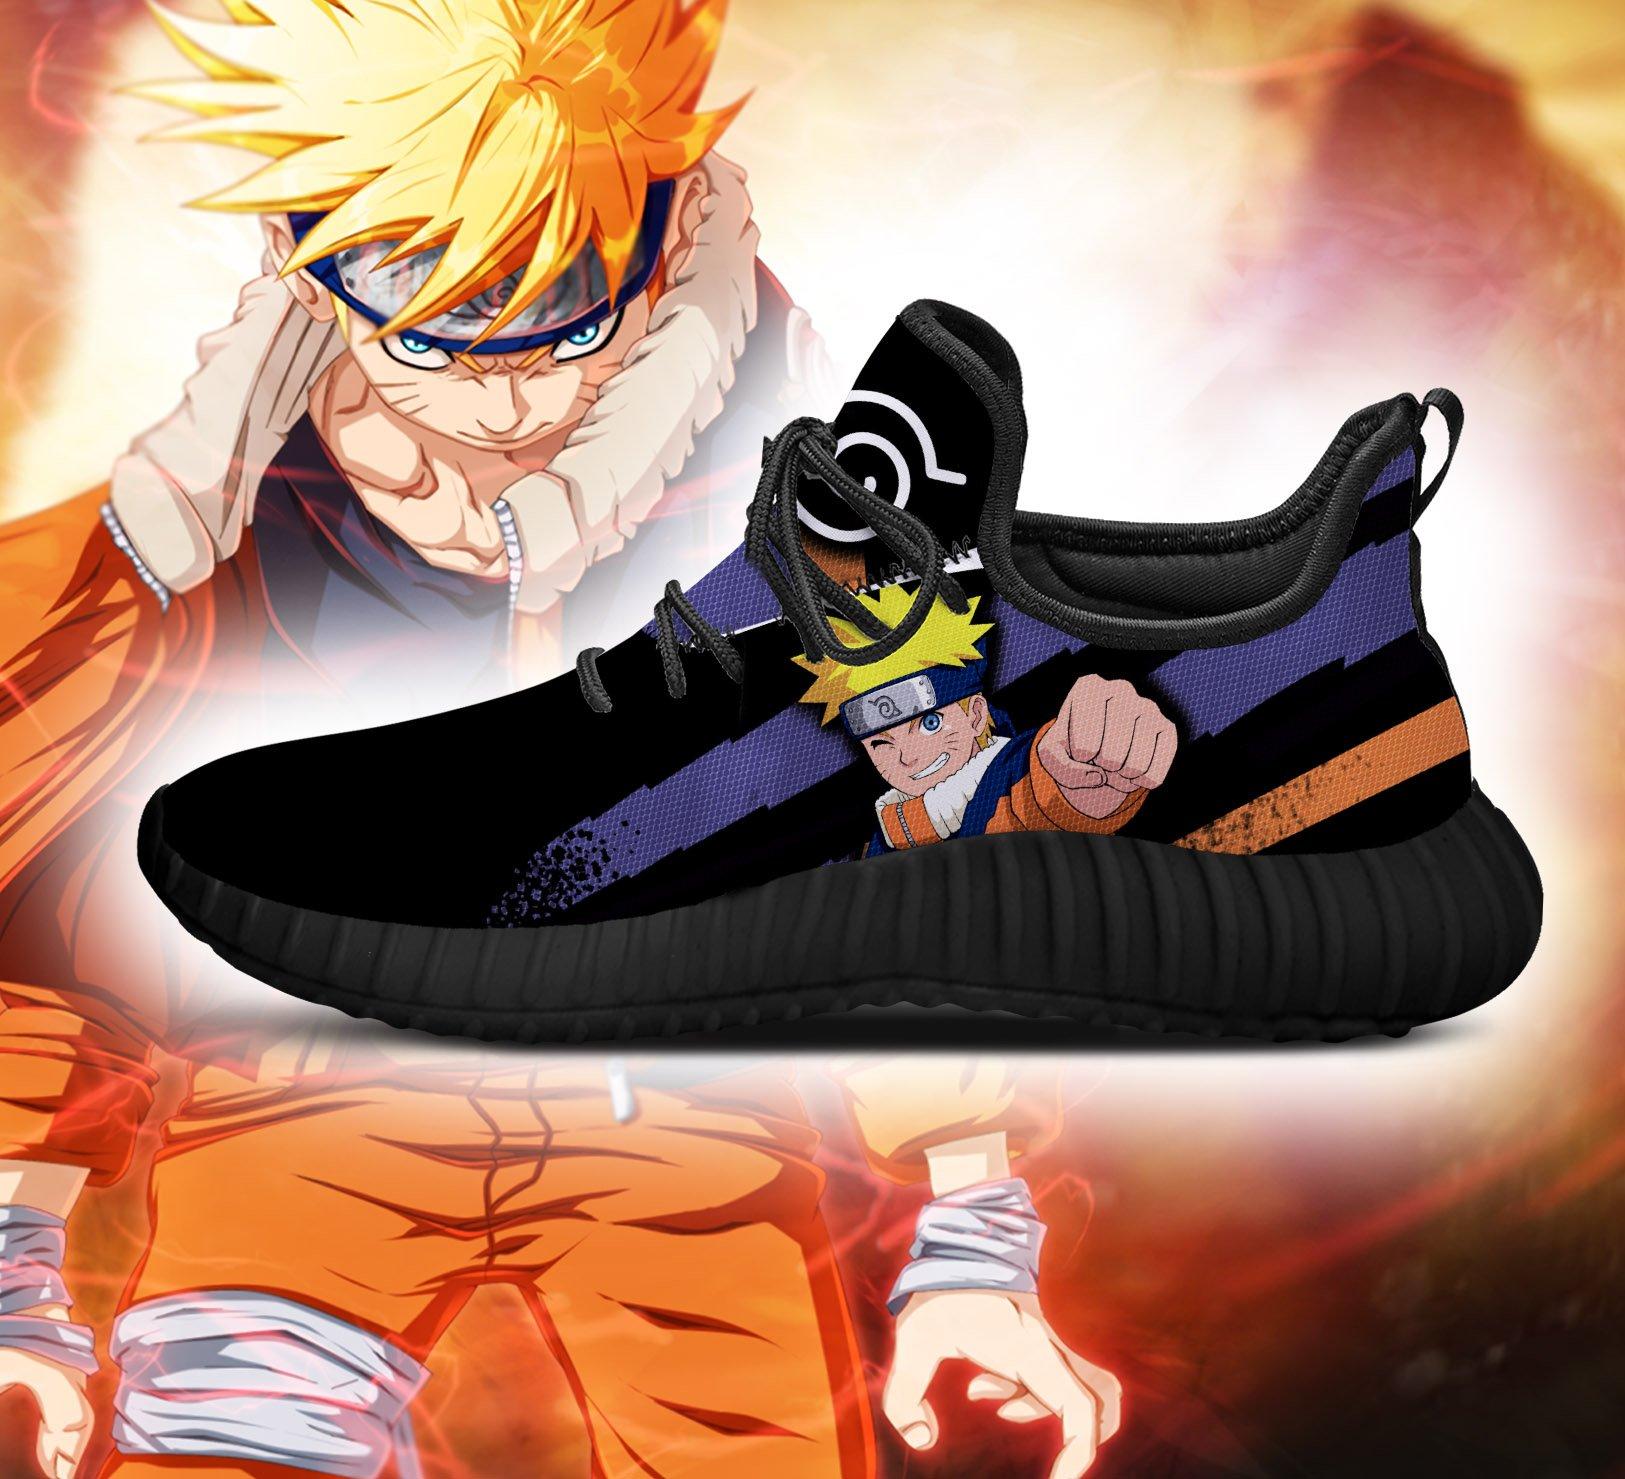 Naruto Fighting Reze Shoes Naruto Anime Shoes Fan Gift Idea Tt03 Tazazoncom    Kuroprints